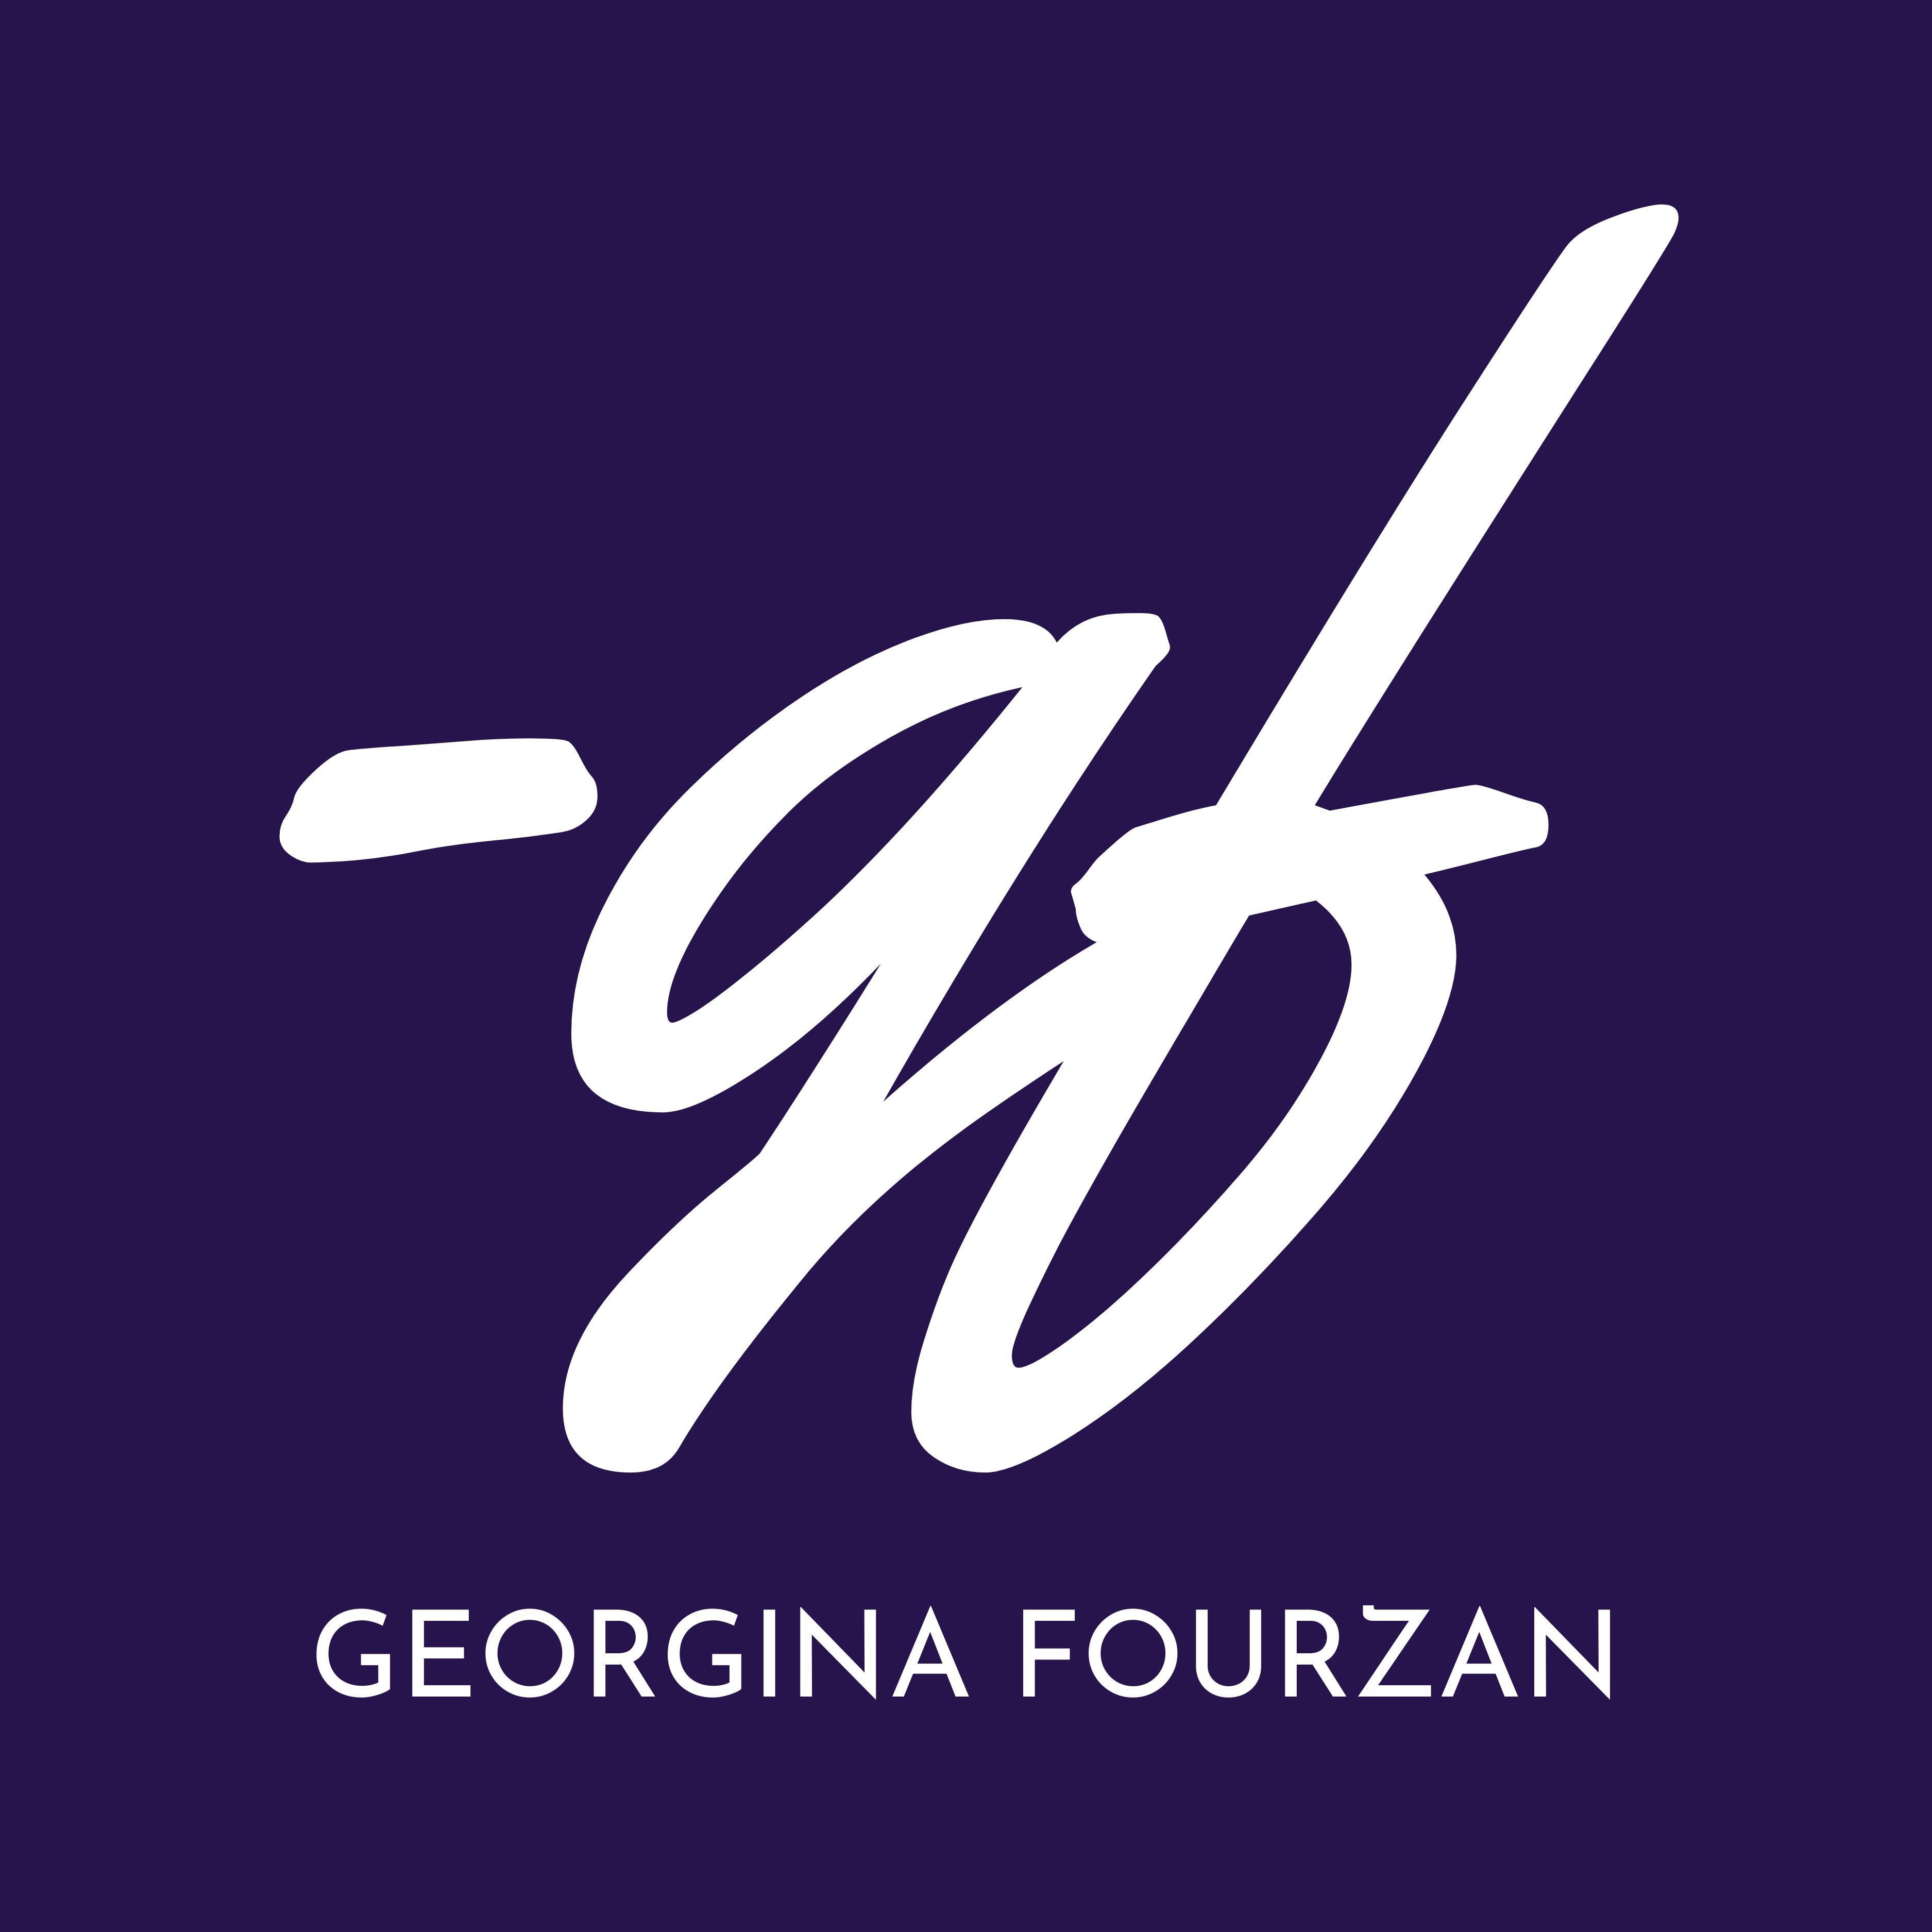 Georgina Fourzan